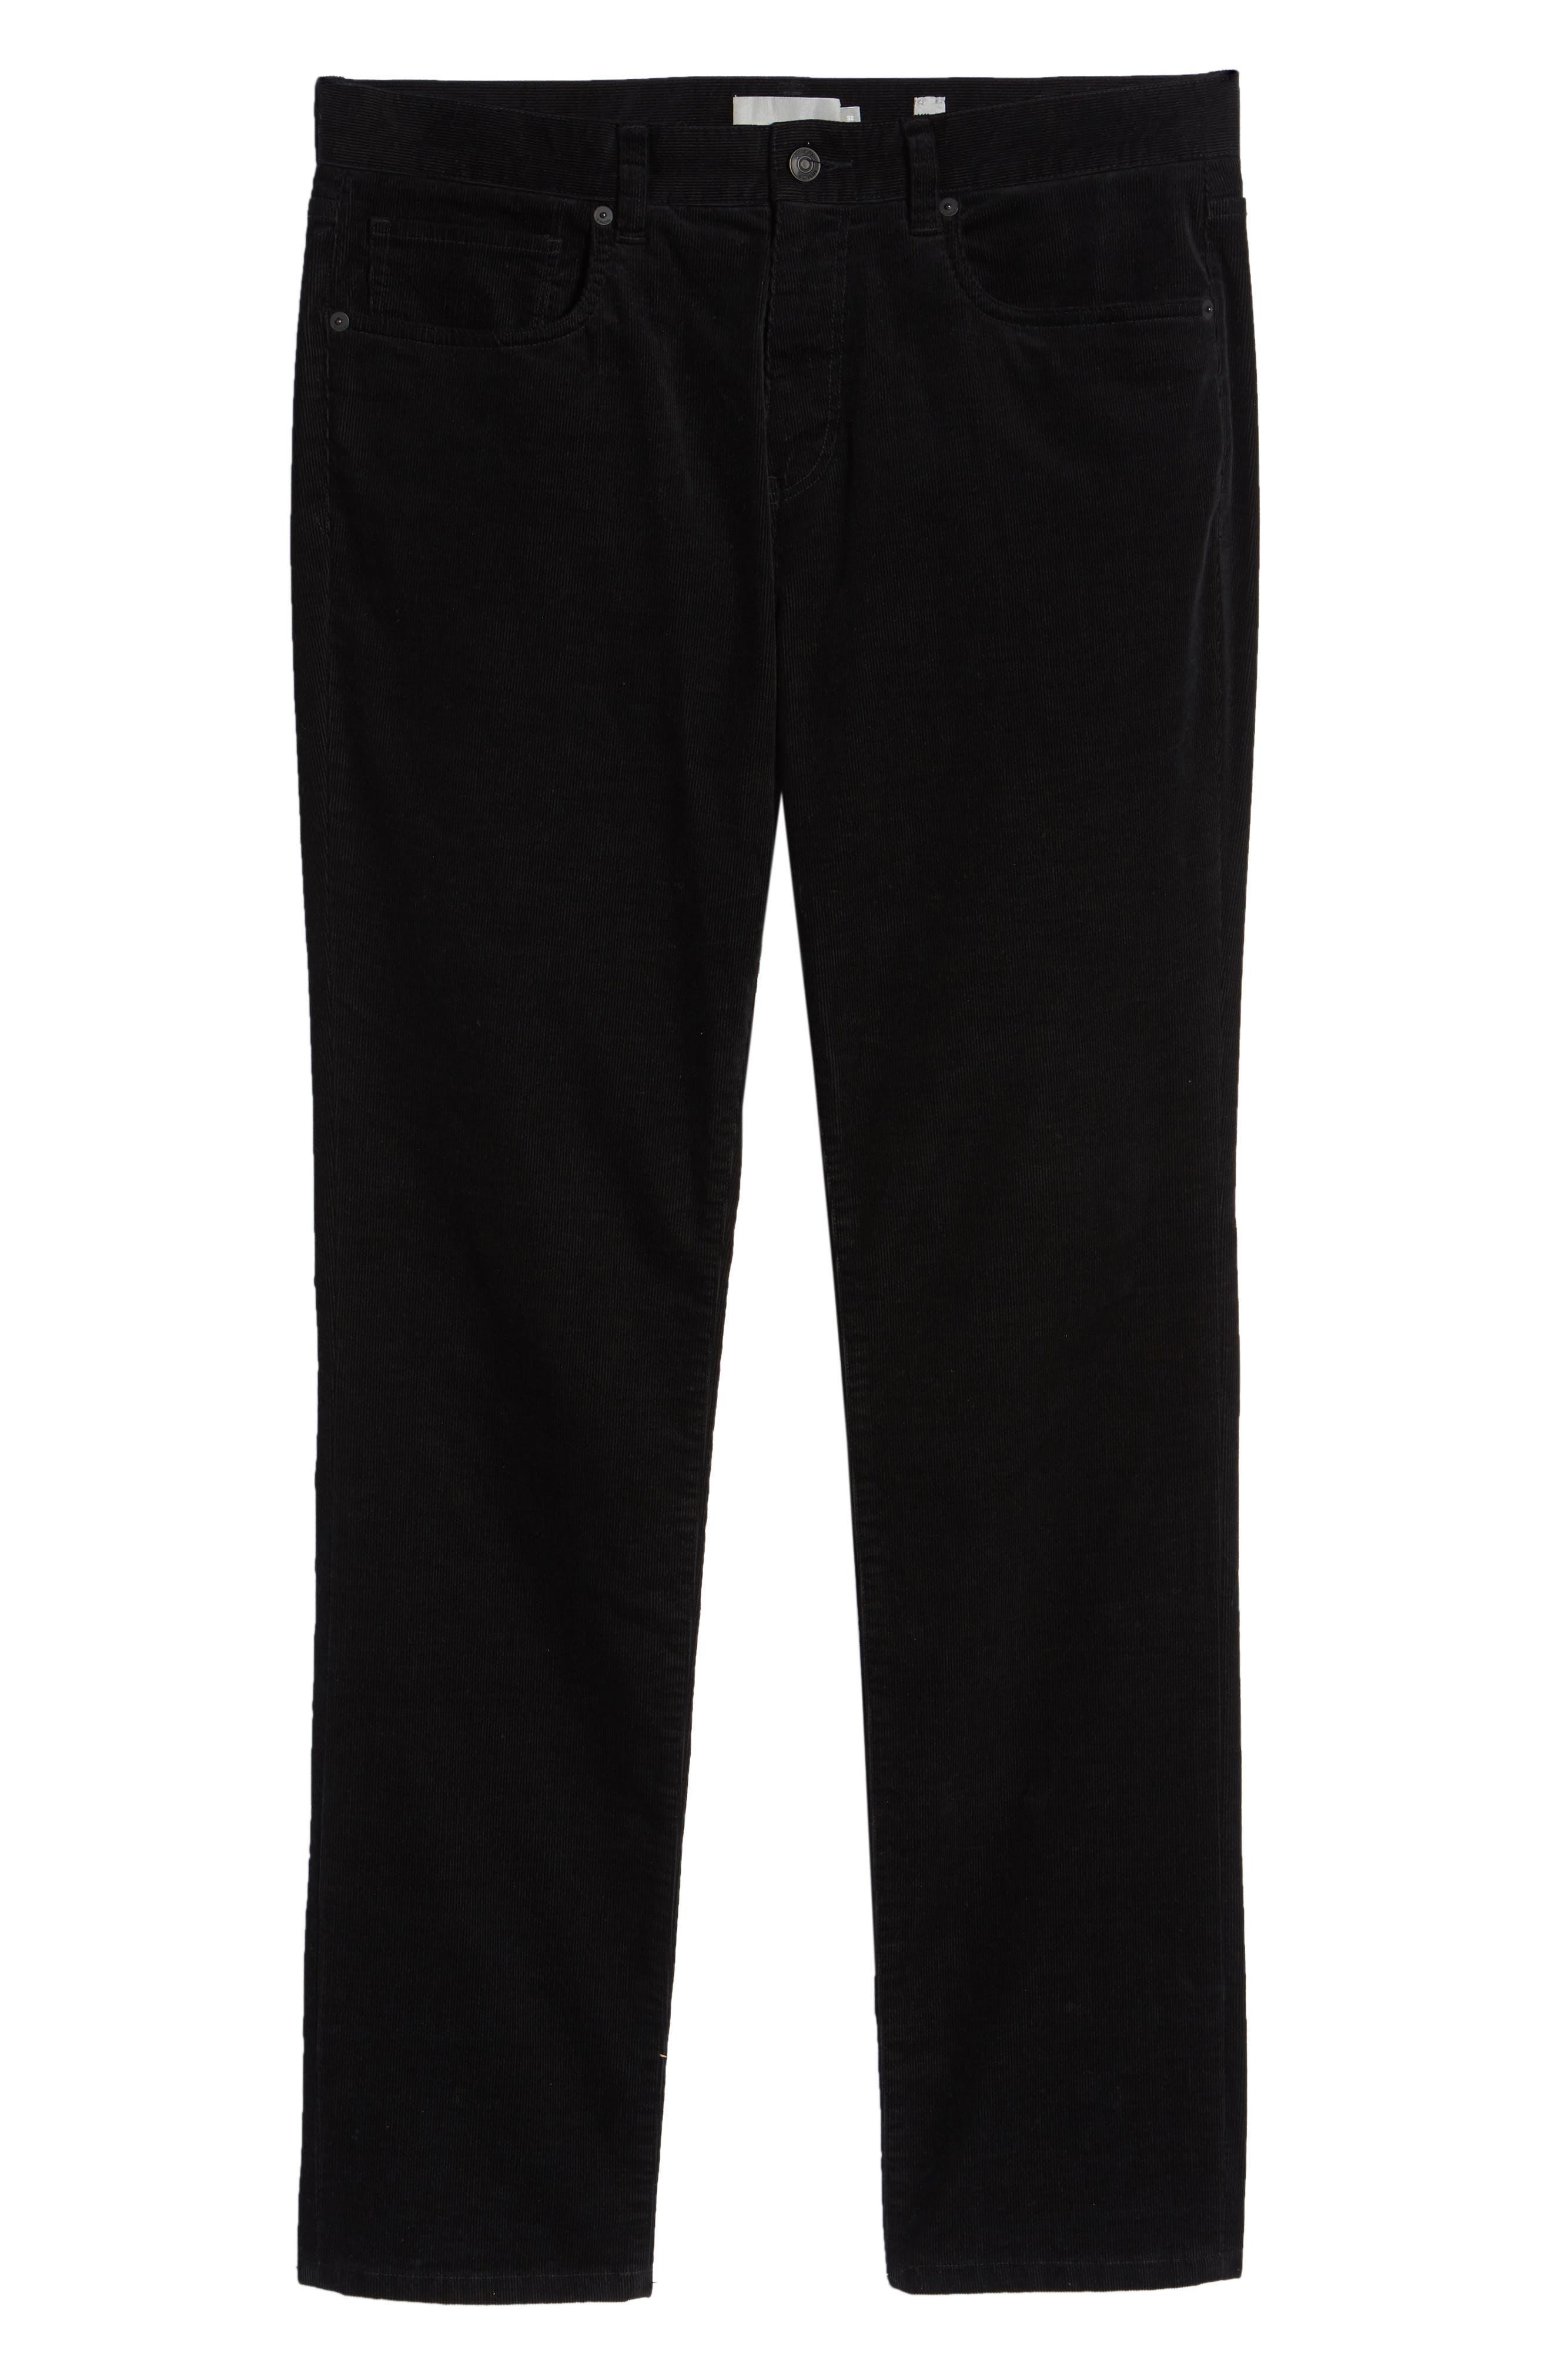 Dylan Slim Fit Corduroy Pants,                             Alternate thumbnail 6, color,                             001